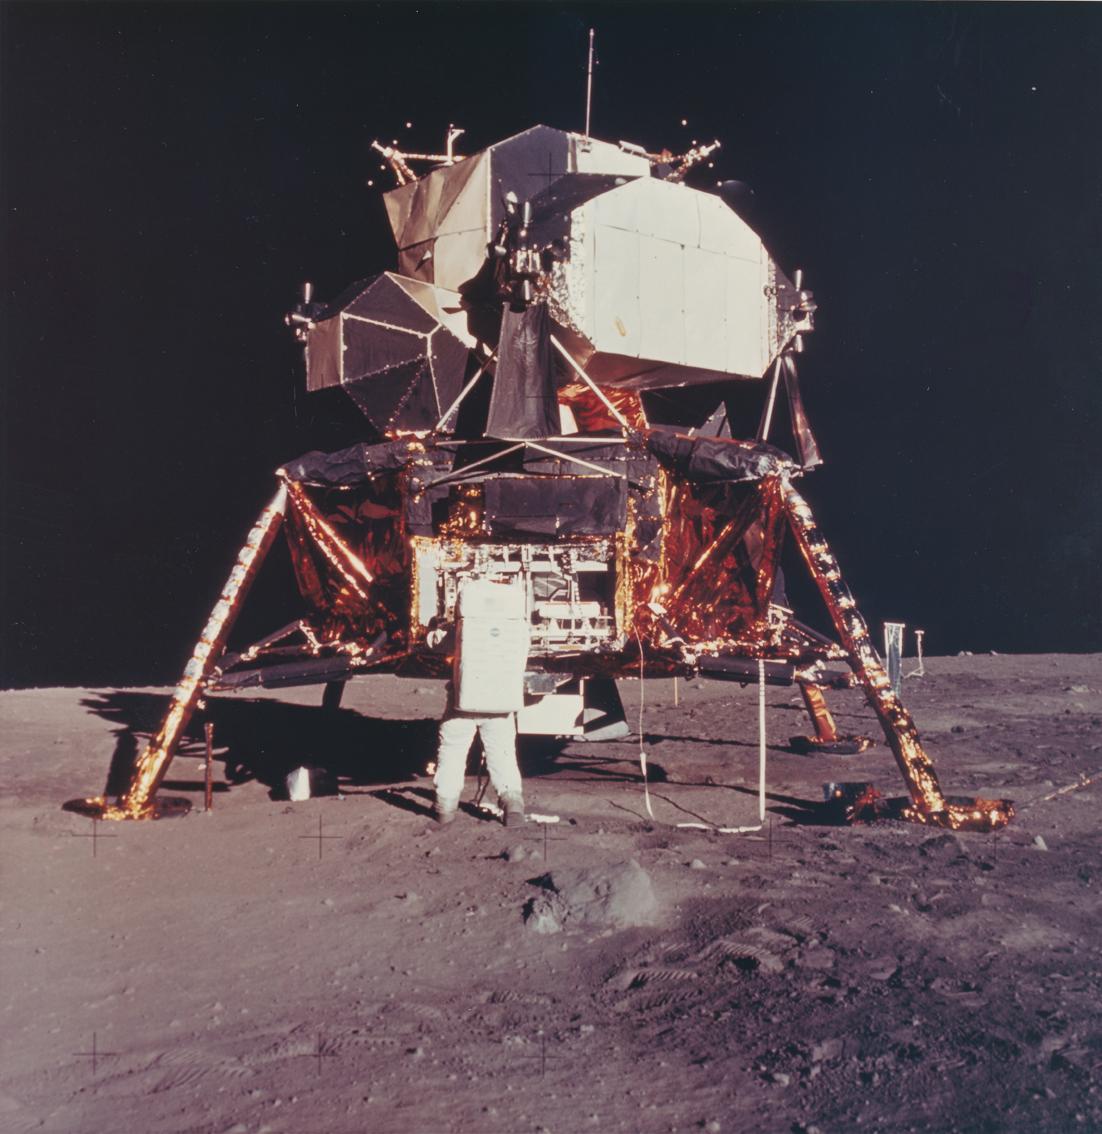 Lot 35 - Nasa. Mission Apollo 11. L'astronaute Buzz Aldrin s'affaire dans l'armoire de [...]